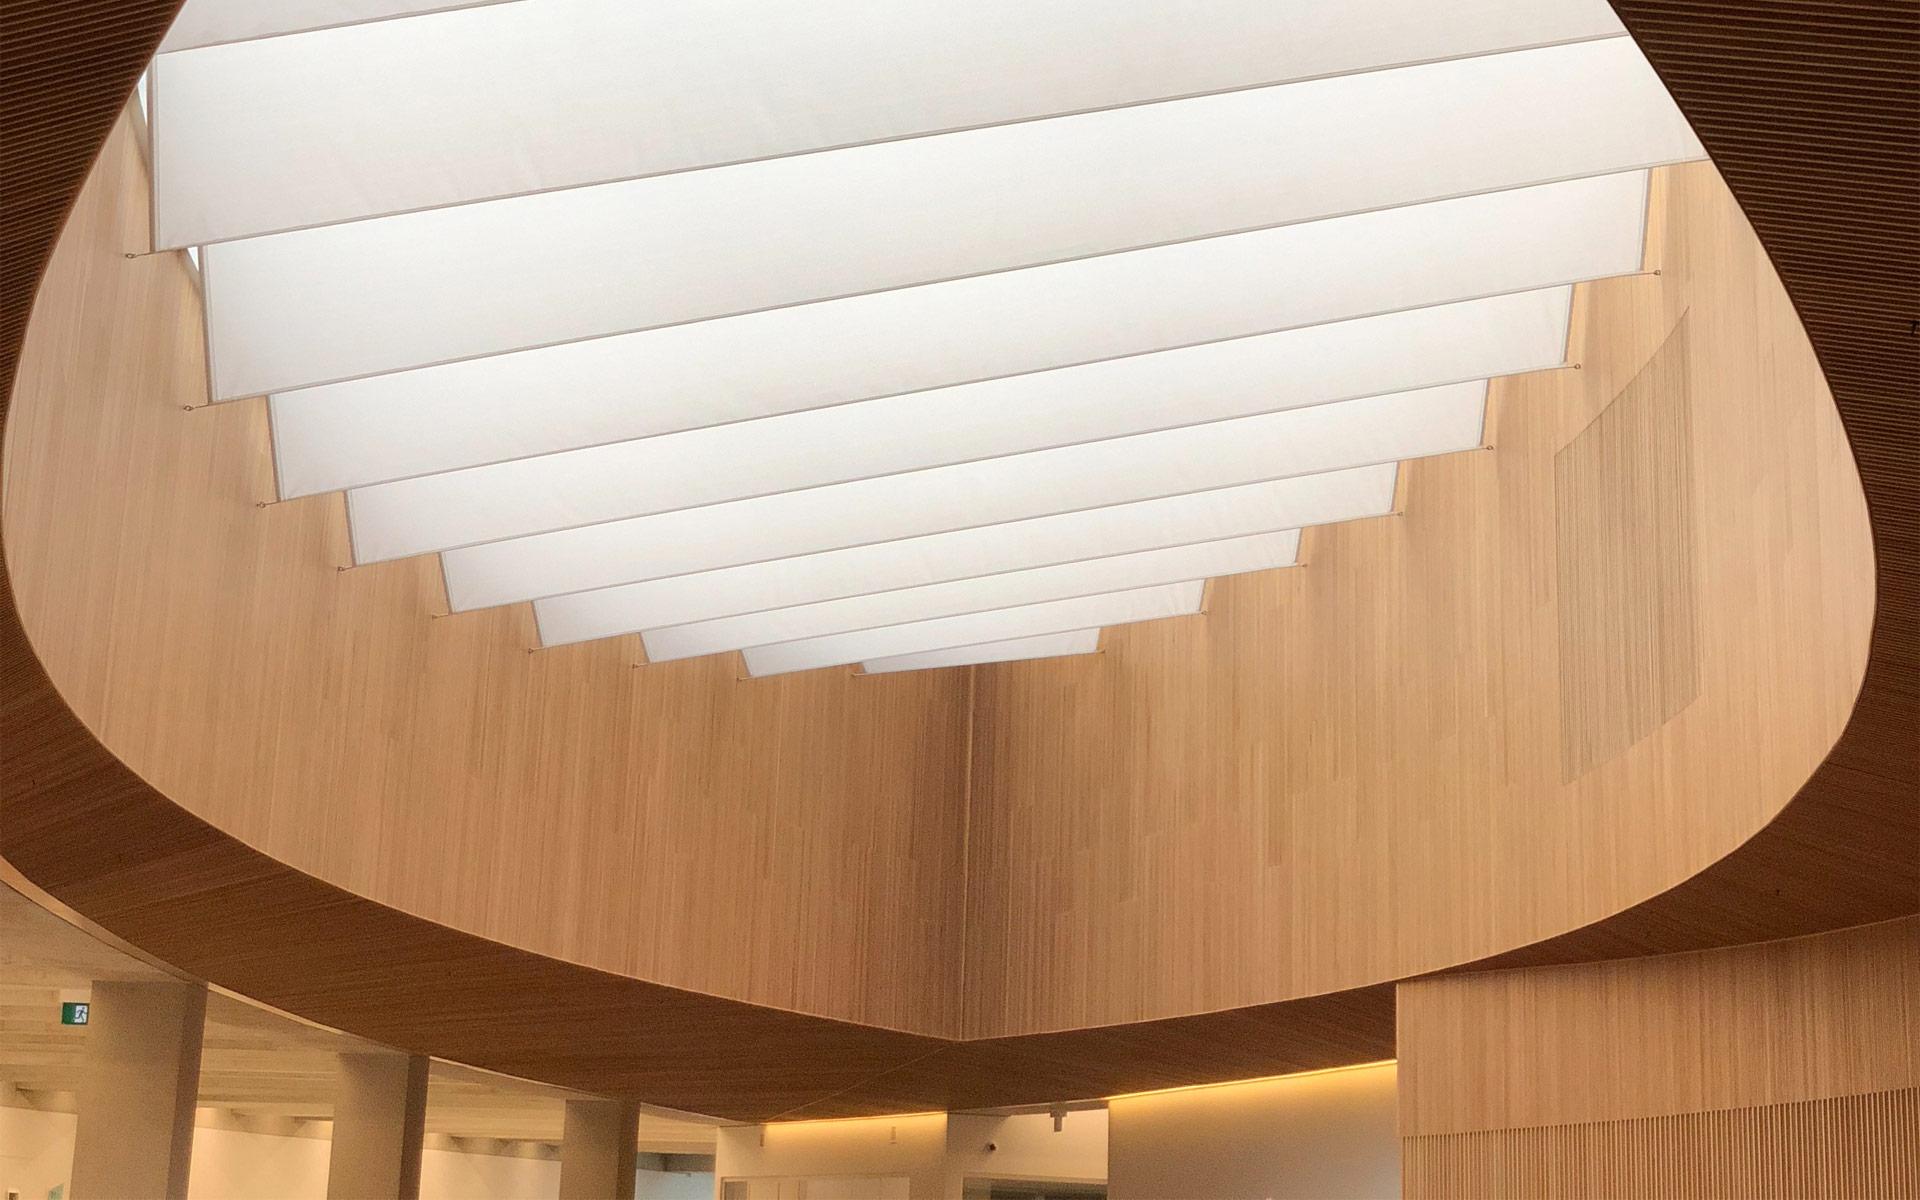 Lighting-Manufacturer-Standout-Image